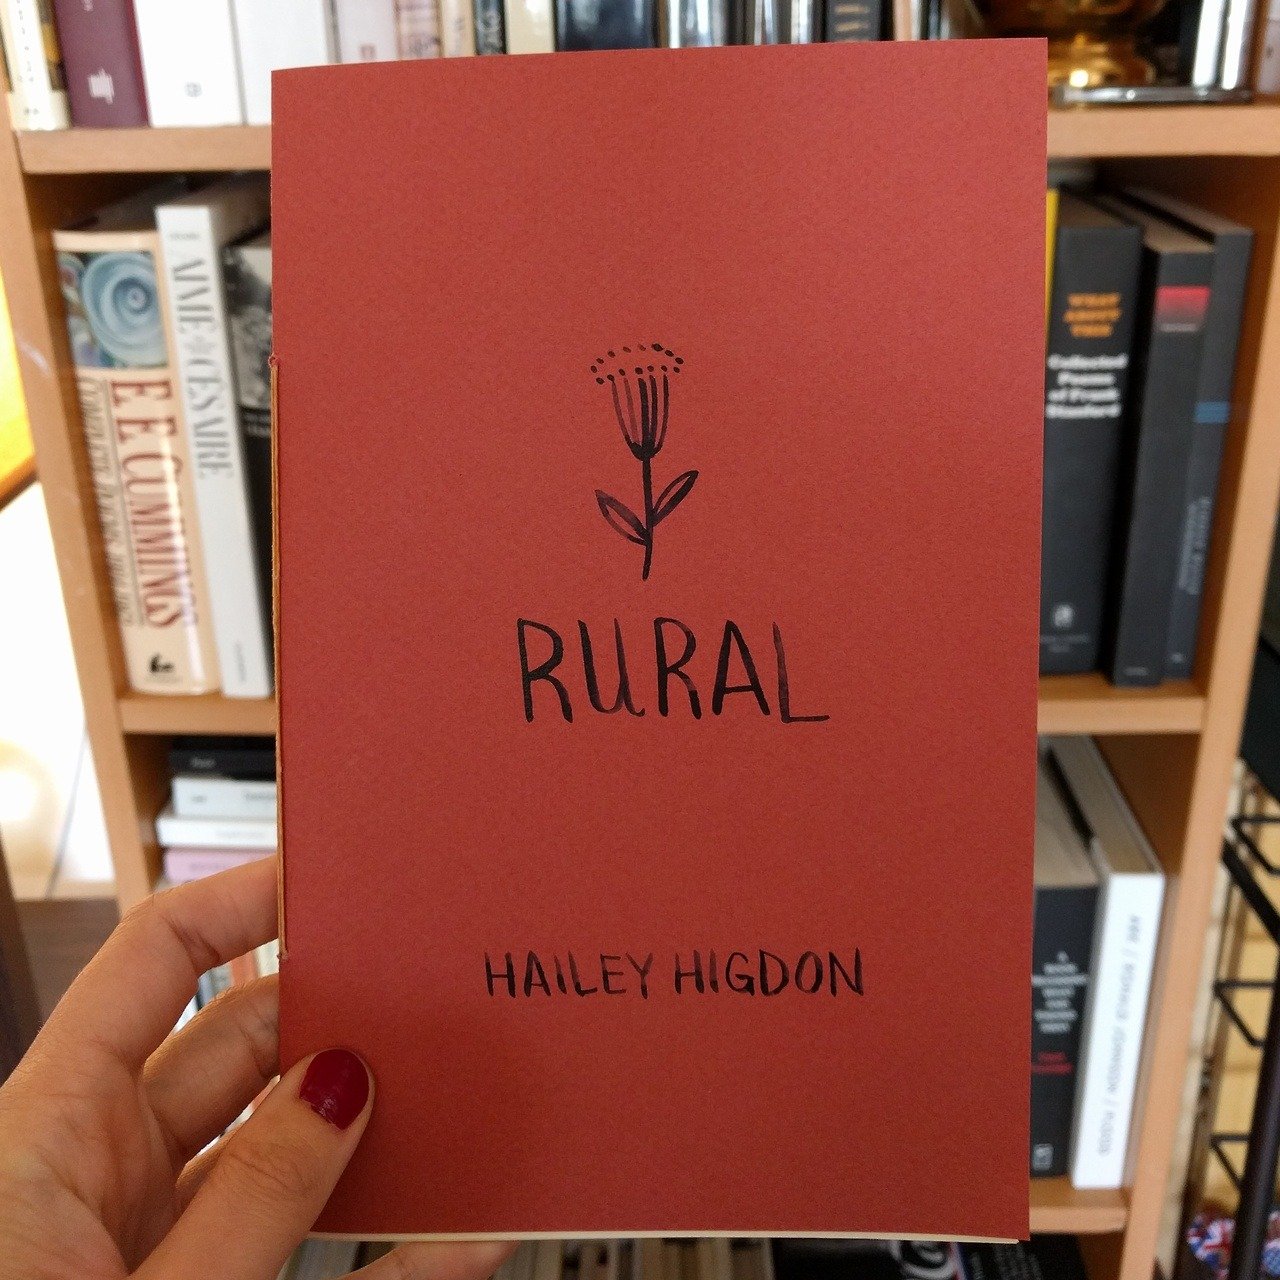 hailey higdon rural